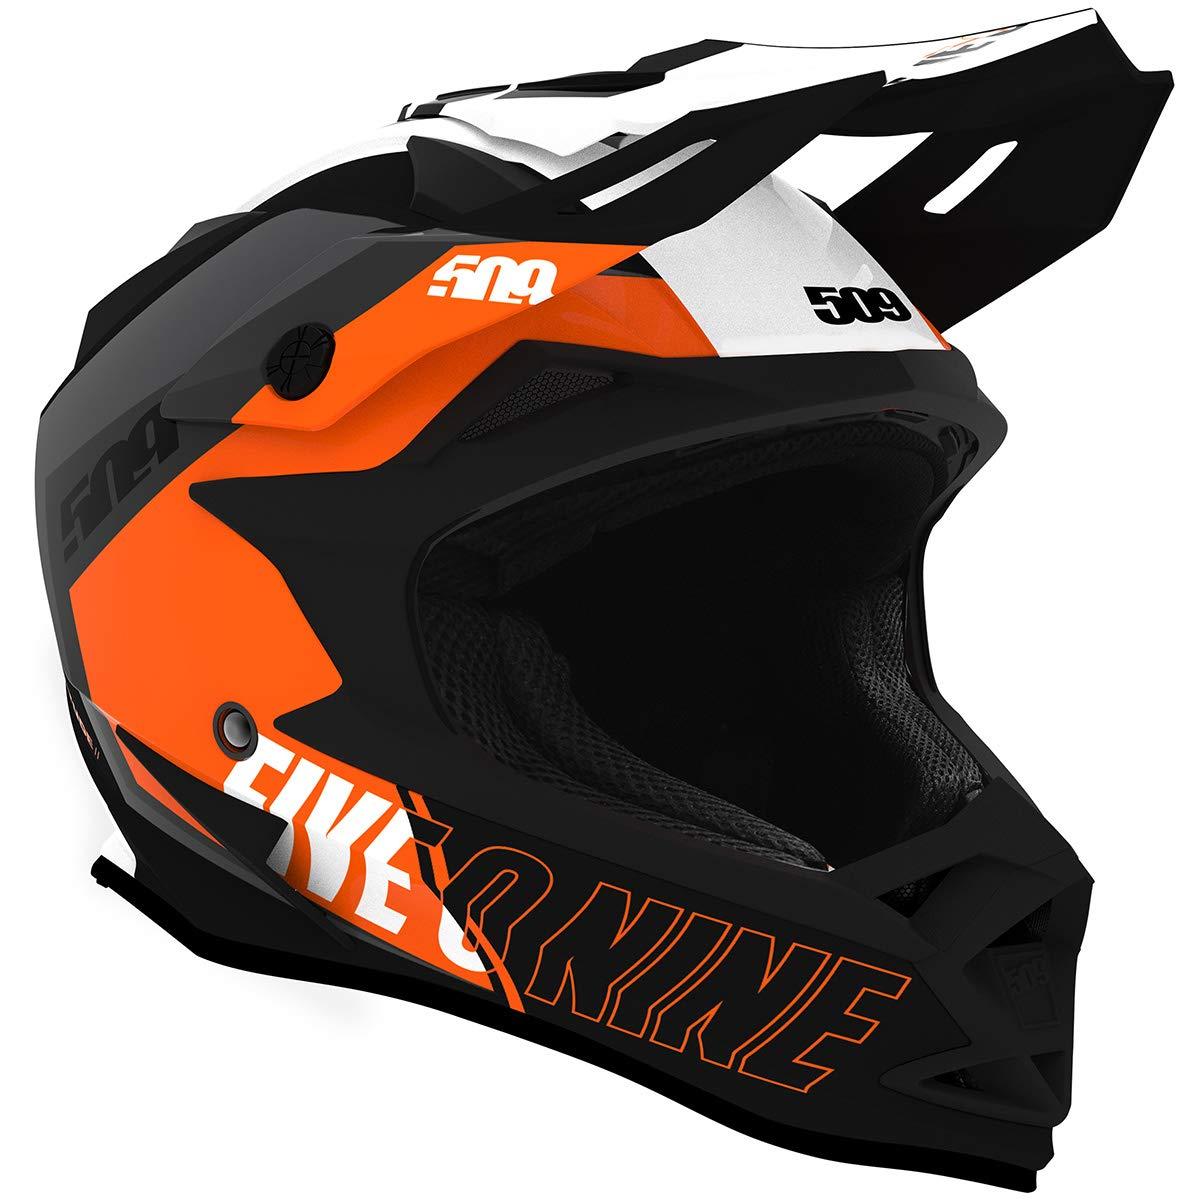 509 Altitude Offroad Helmet with Fidlock 509-MX-HEL-AORG Orange Ridge - Large